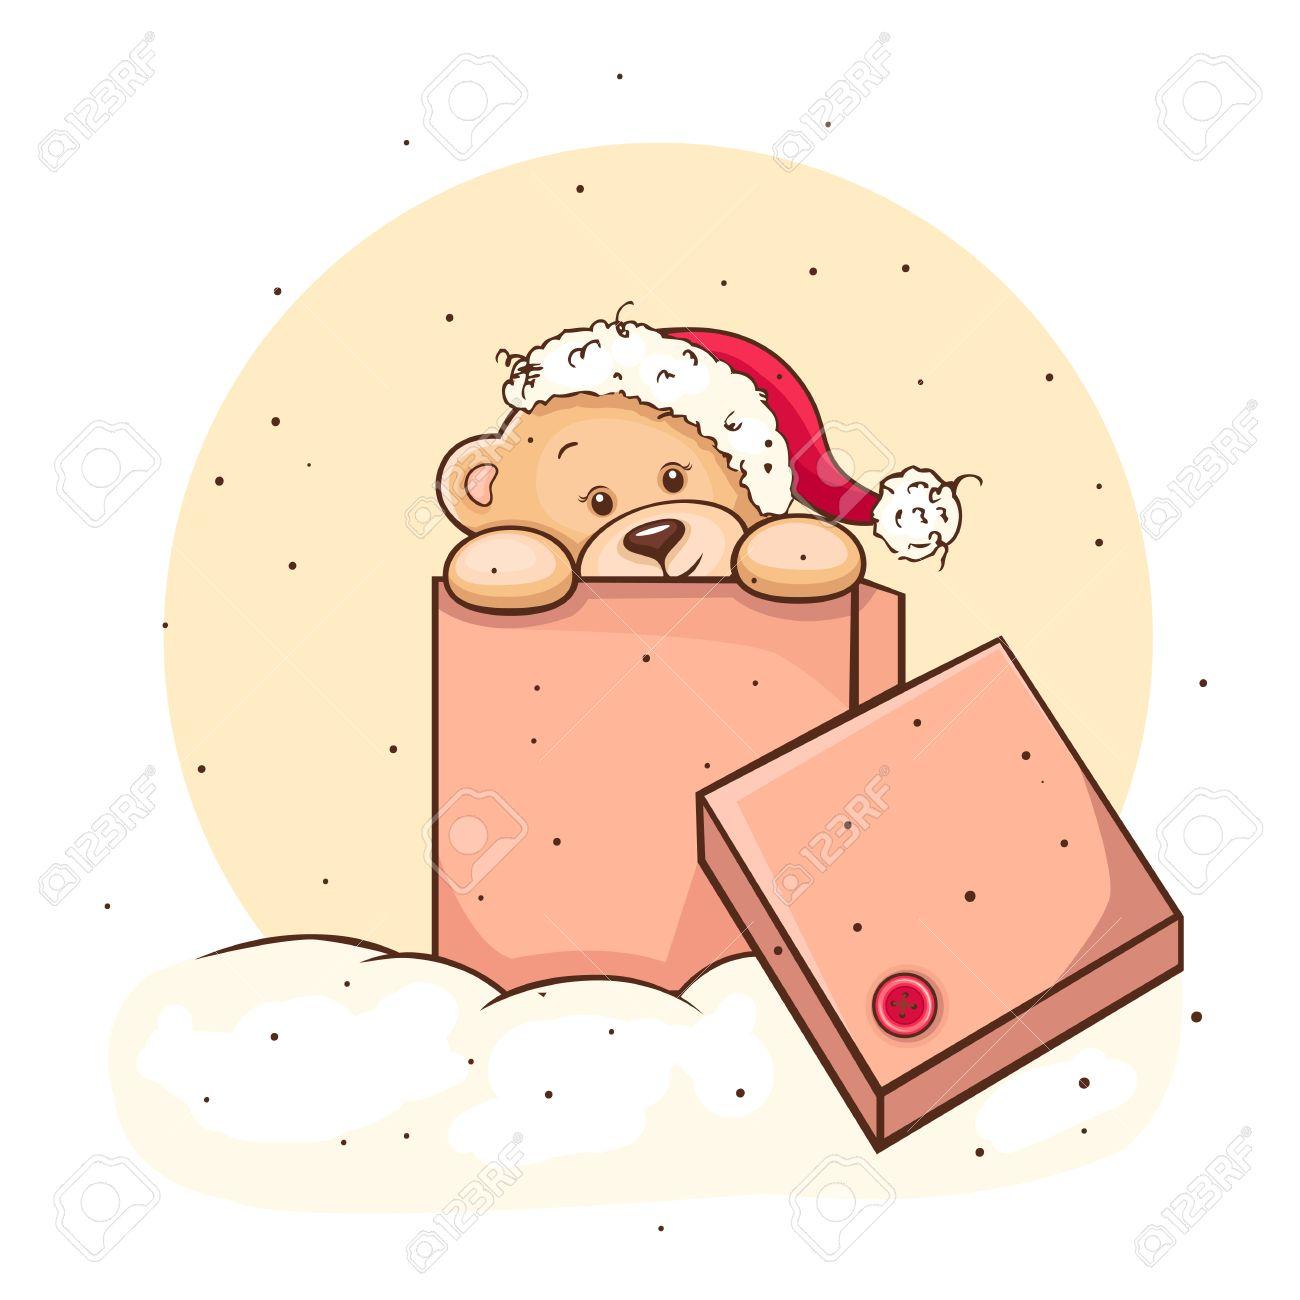 Illustration Of Cute Christmas Teddy Bear In Box, For Xmas Design ...